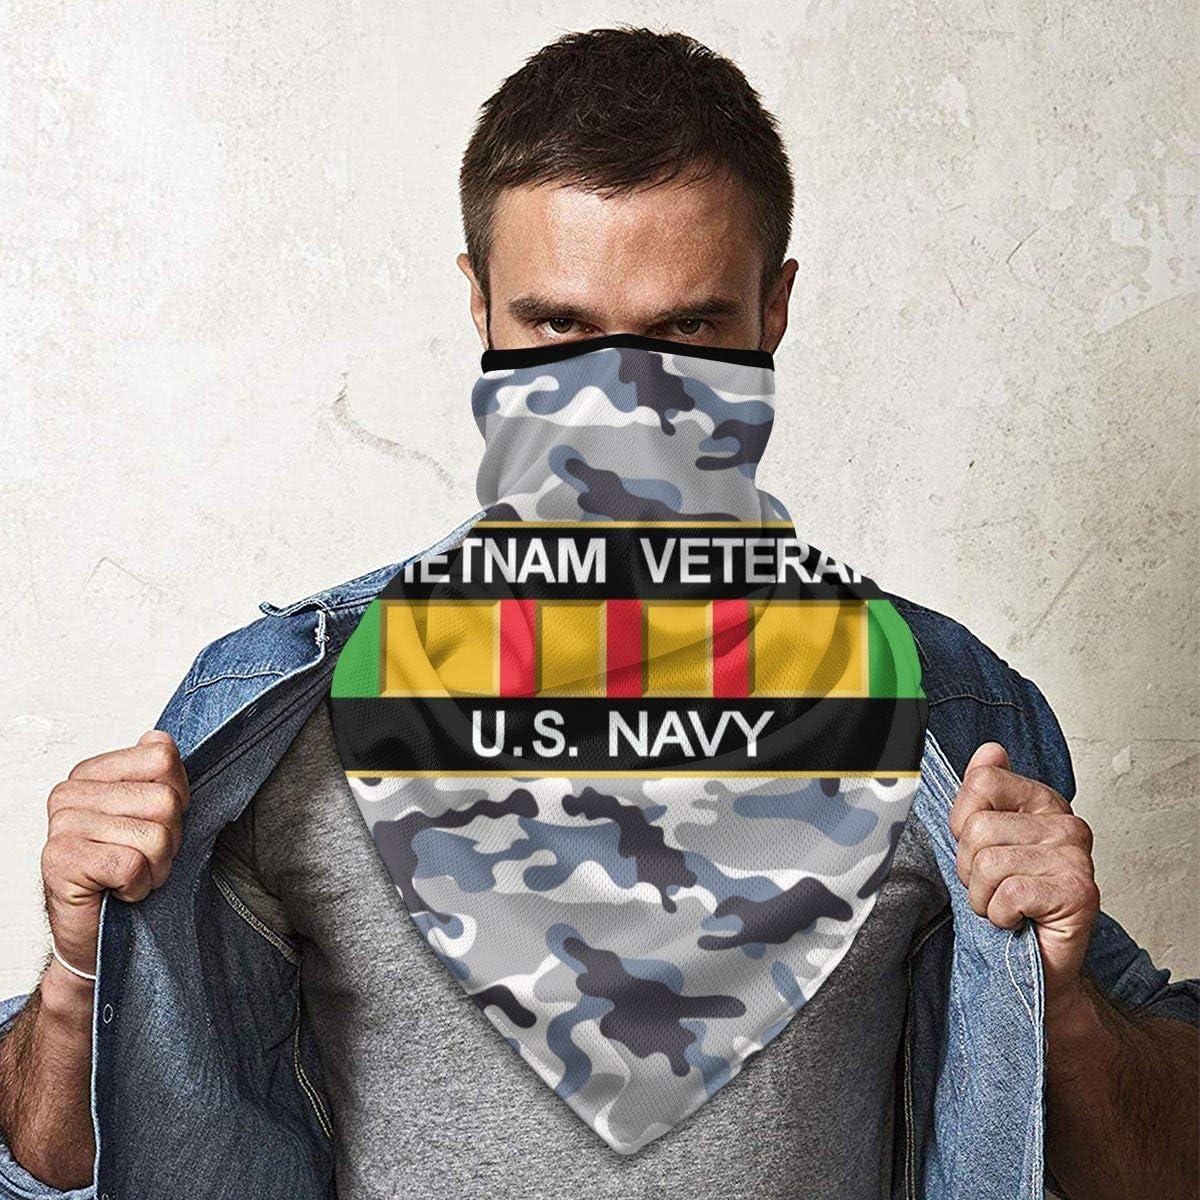 Vietnam Veteran U.S Navy Outdoor Face Mouth Mask Windproof Sports Mask Ski Mask Shield Scarf Bandana Men Woman